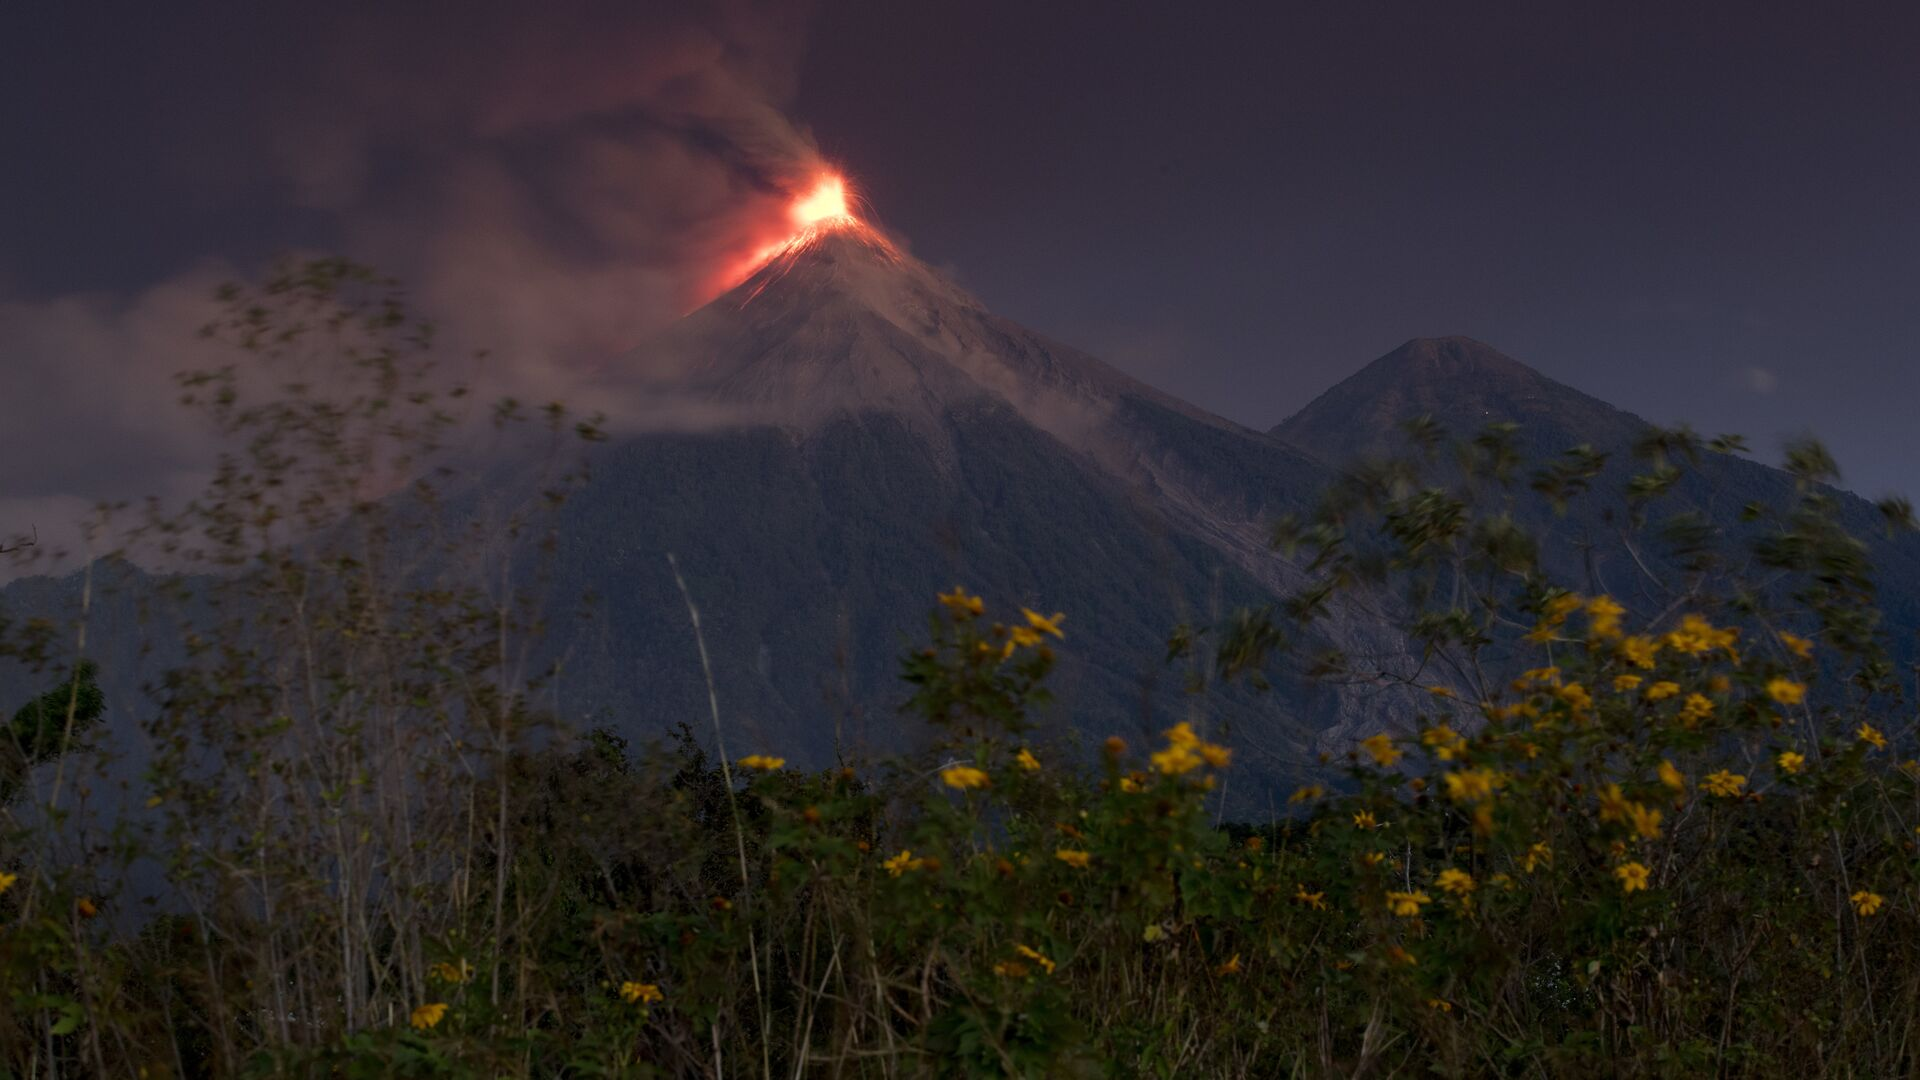 Volcán de Fuego, Guatemala - Sputnik Mundo, 1920, 23.09.2021